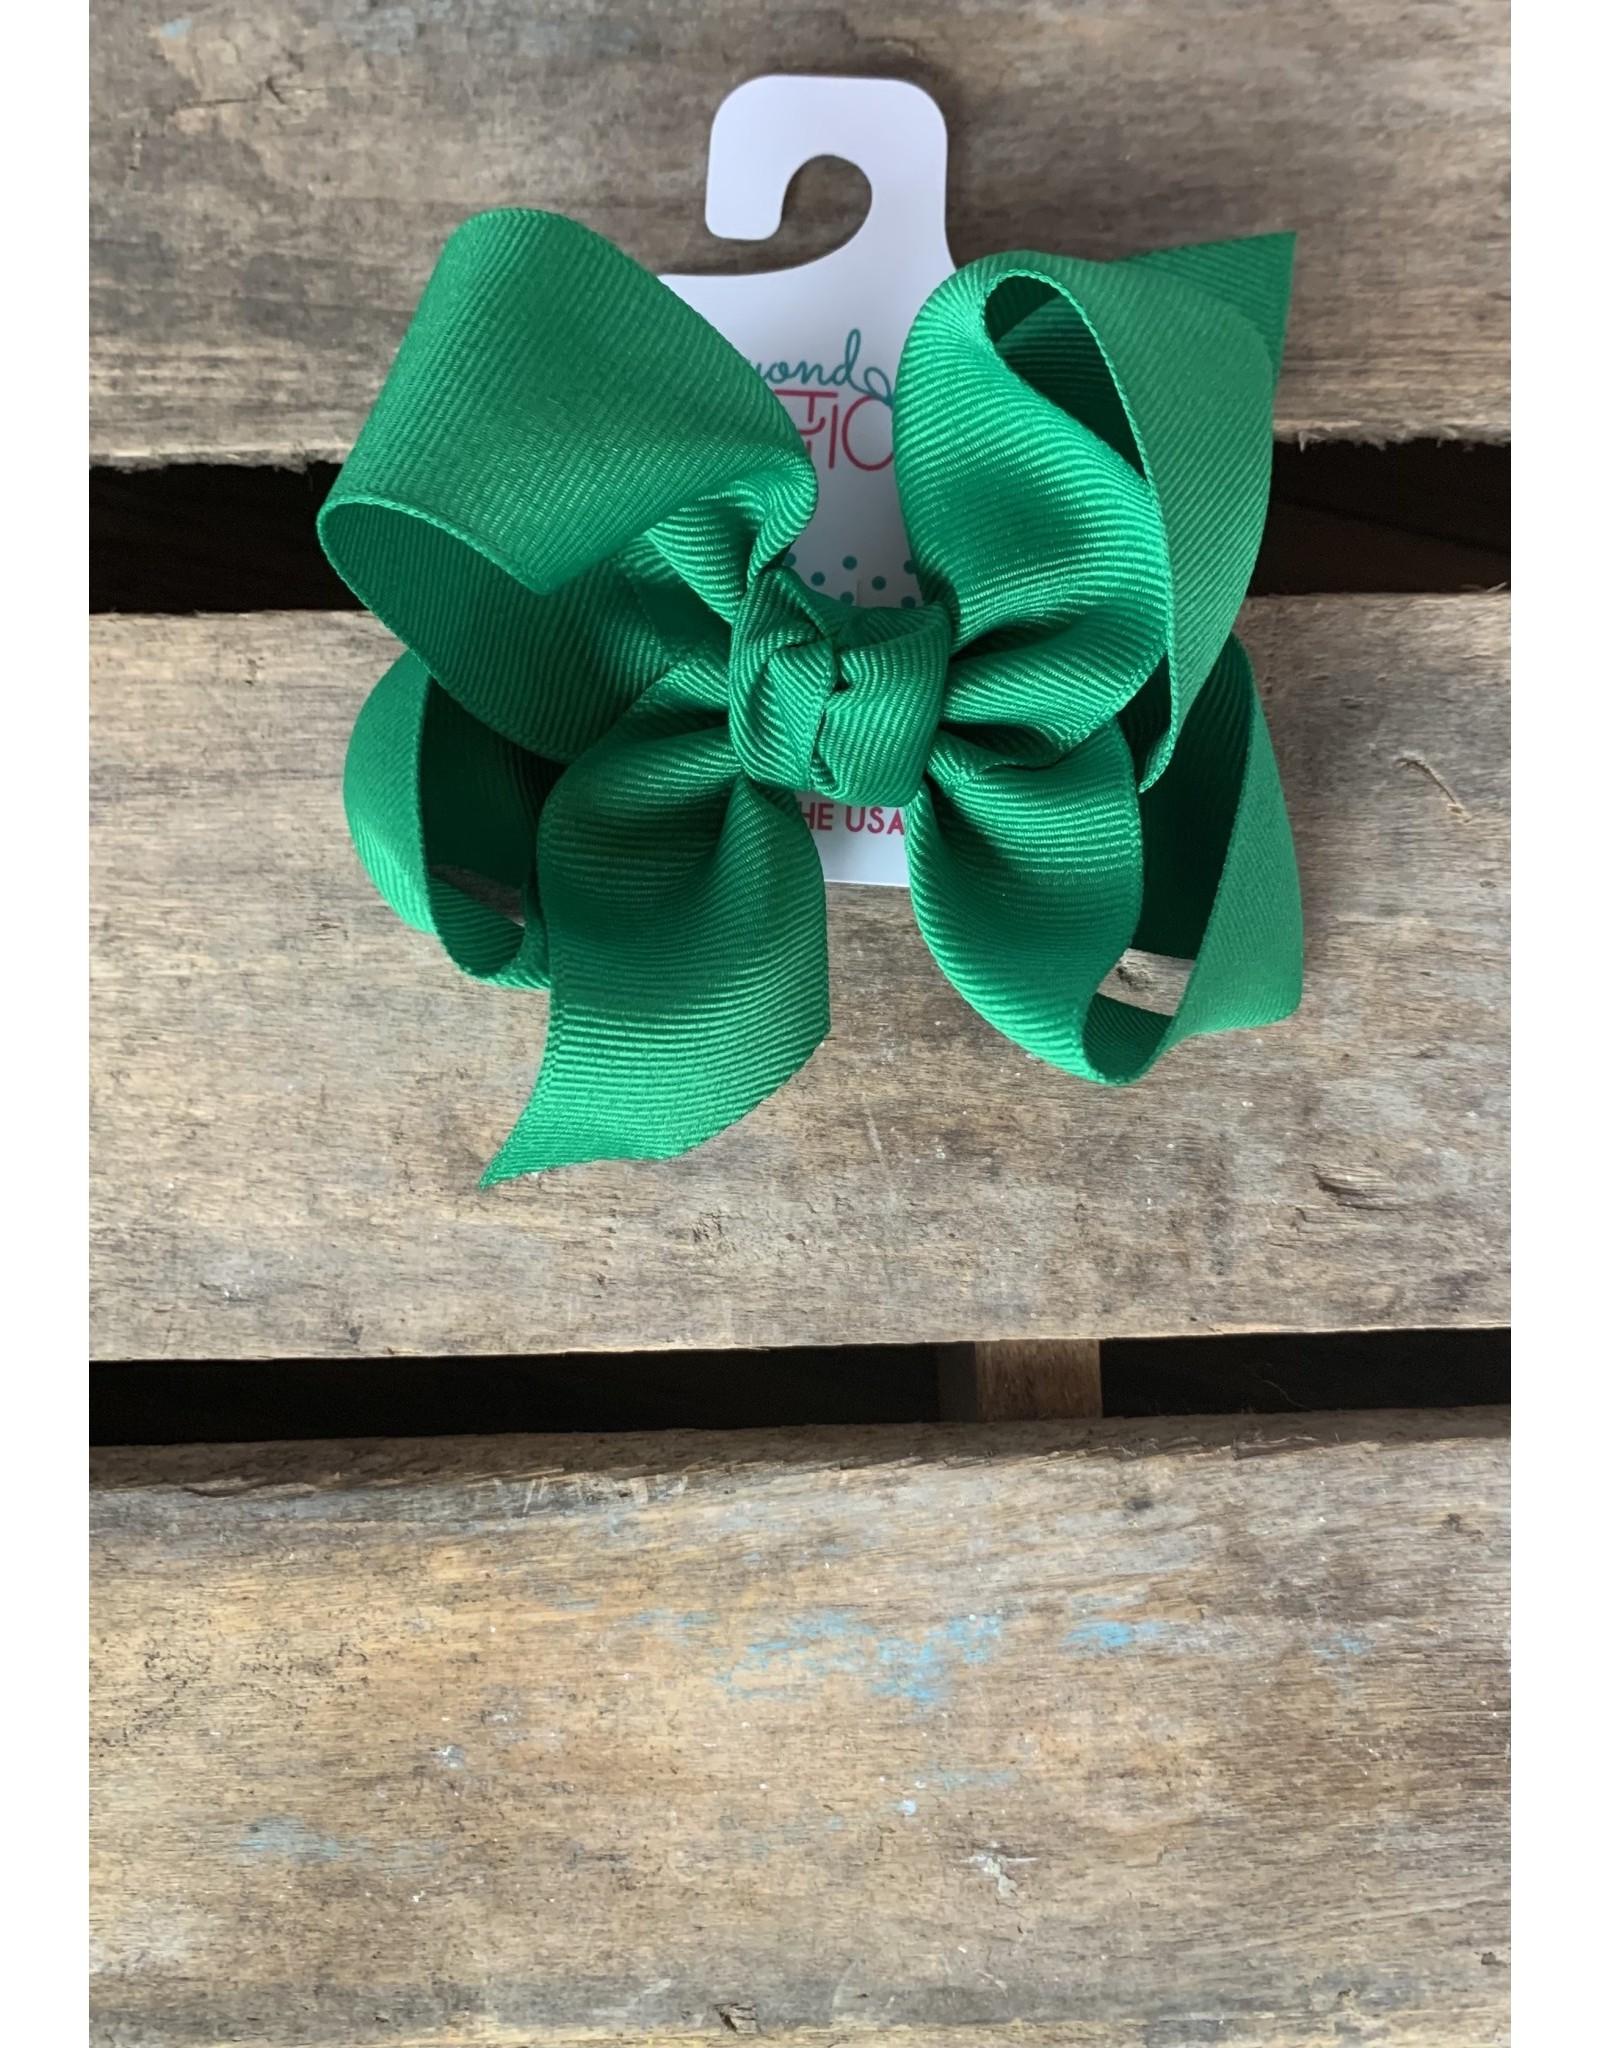 Beyond Creations Beyond Creations- Emerald Grosgrain Knot Bow